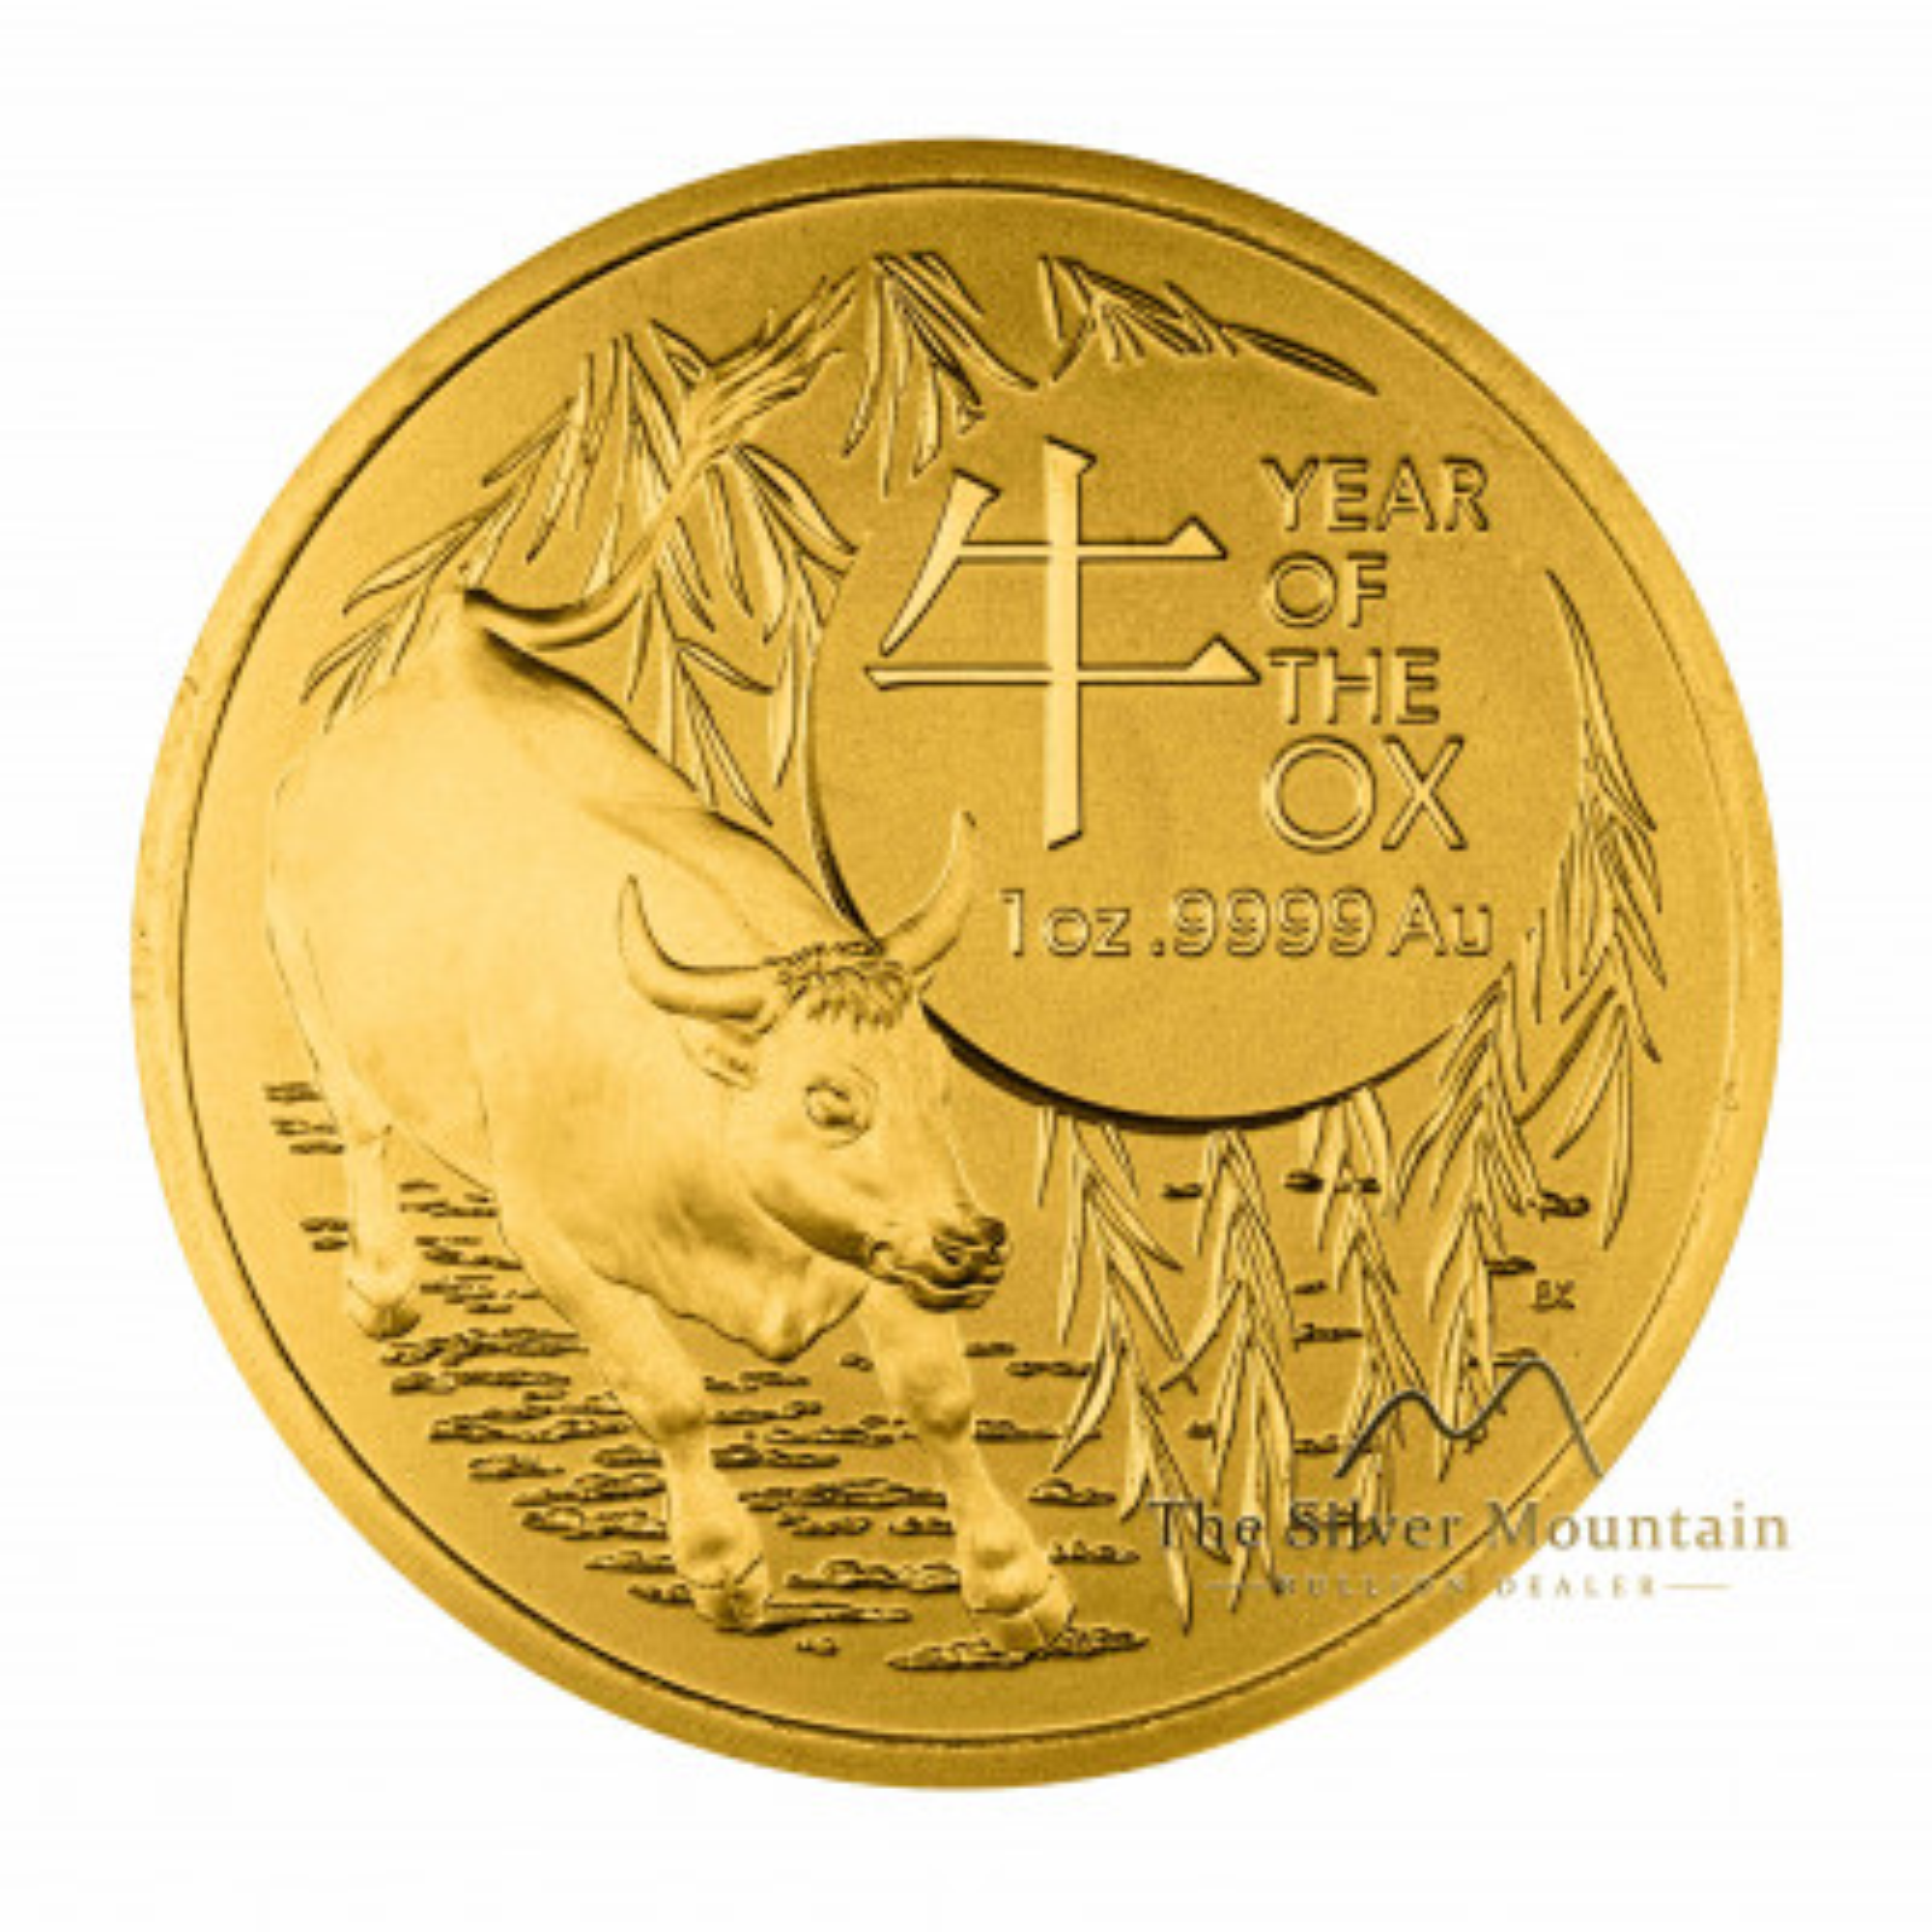 1 troy ounce gouden munt Lunar 2021 Proof